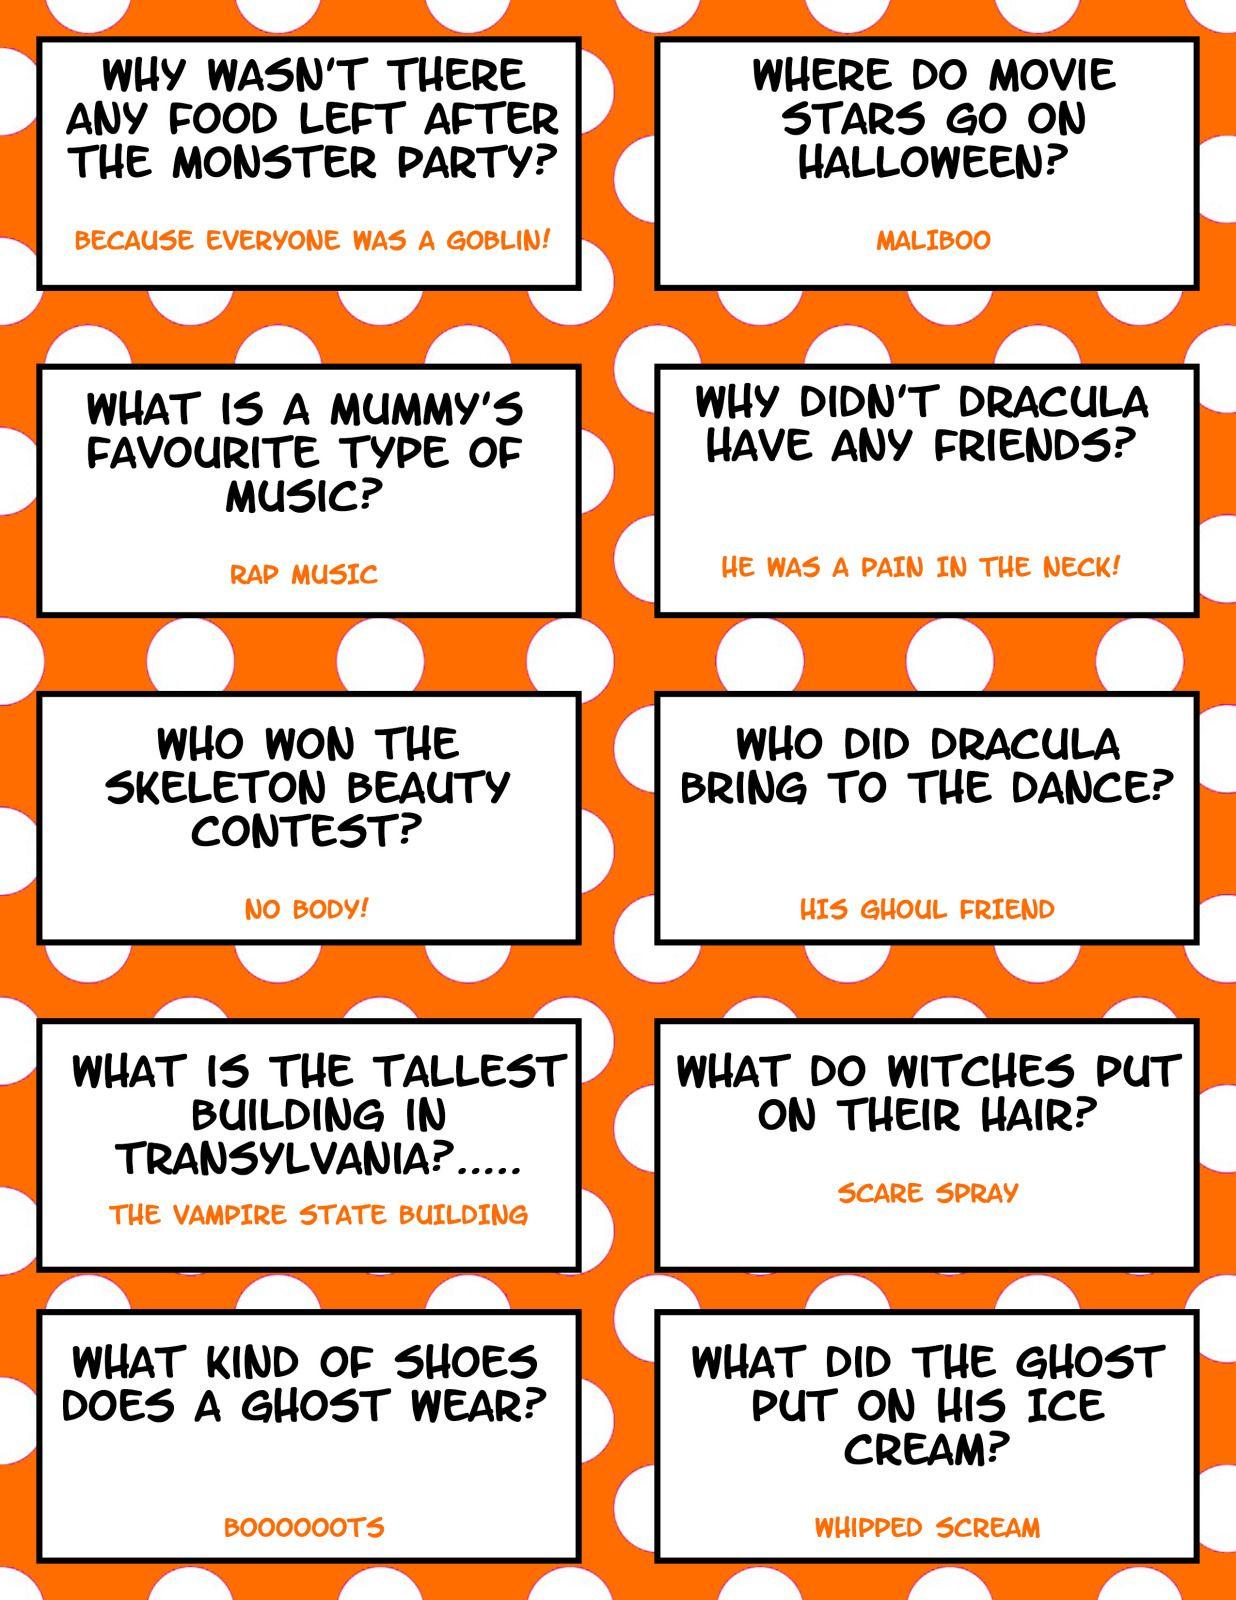 Free Printable Halloween Jokes For Kids - Halloween Lunch Box Jokes - Free Printable Jokes For Adults